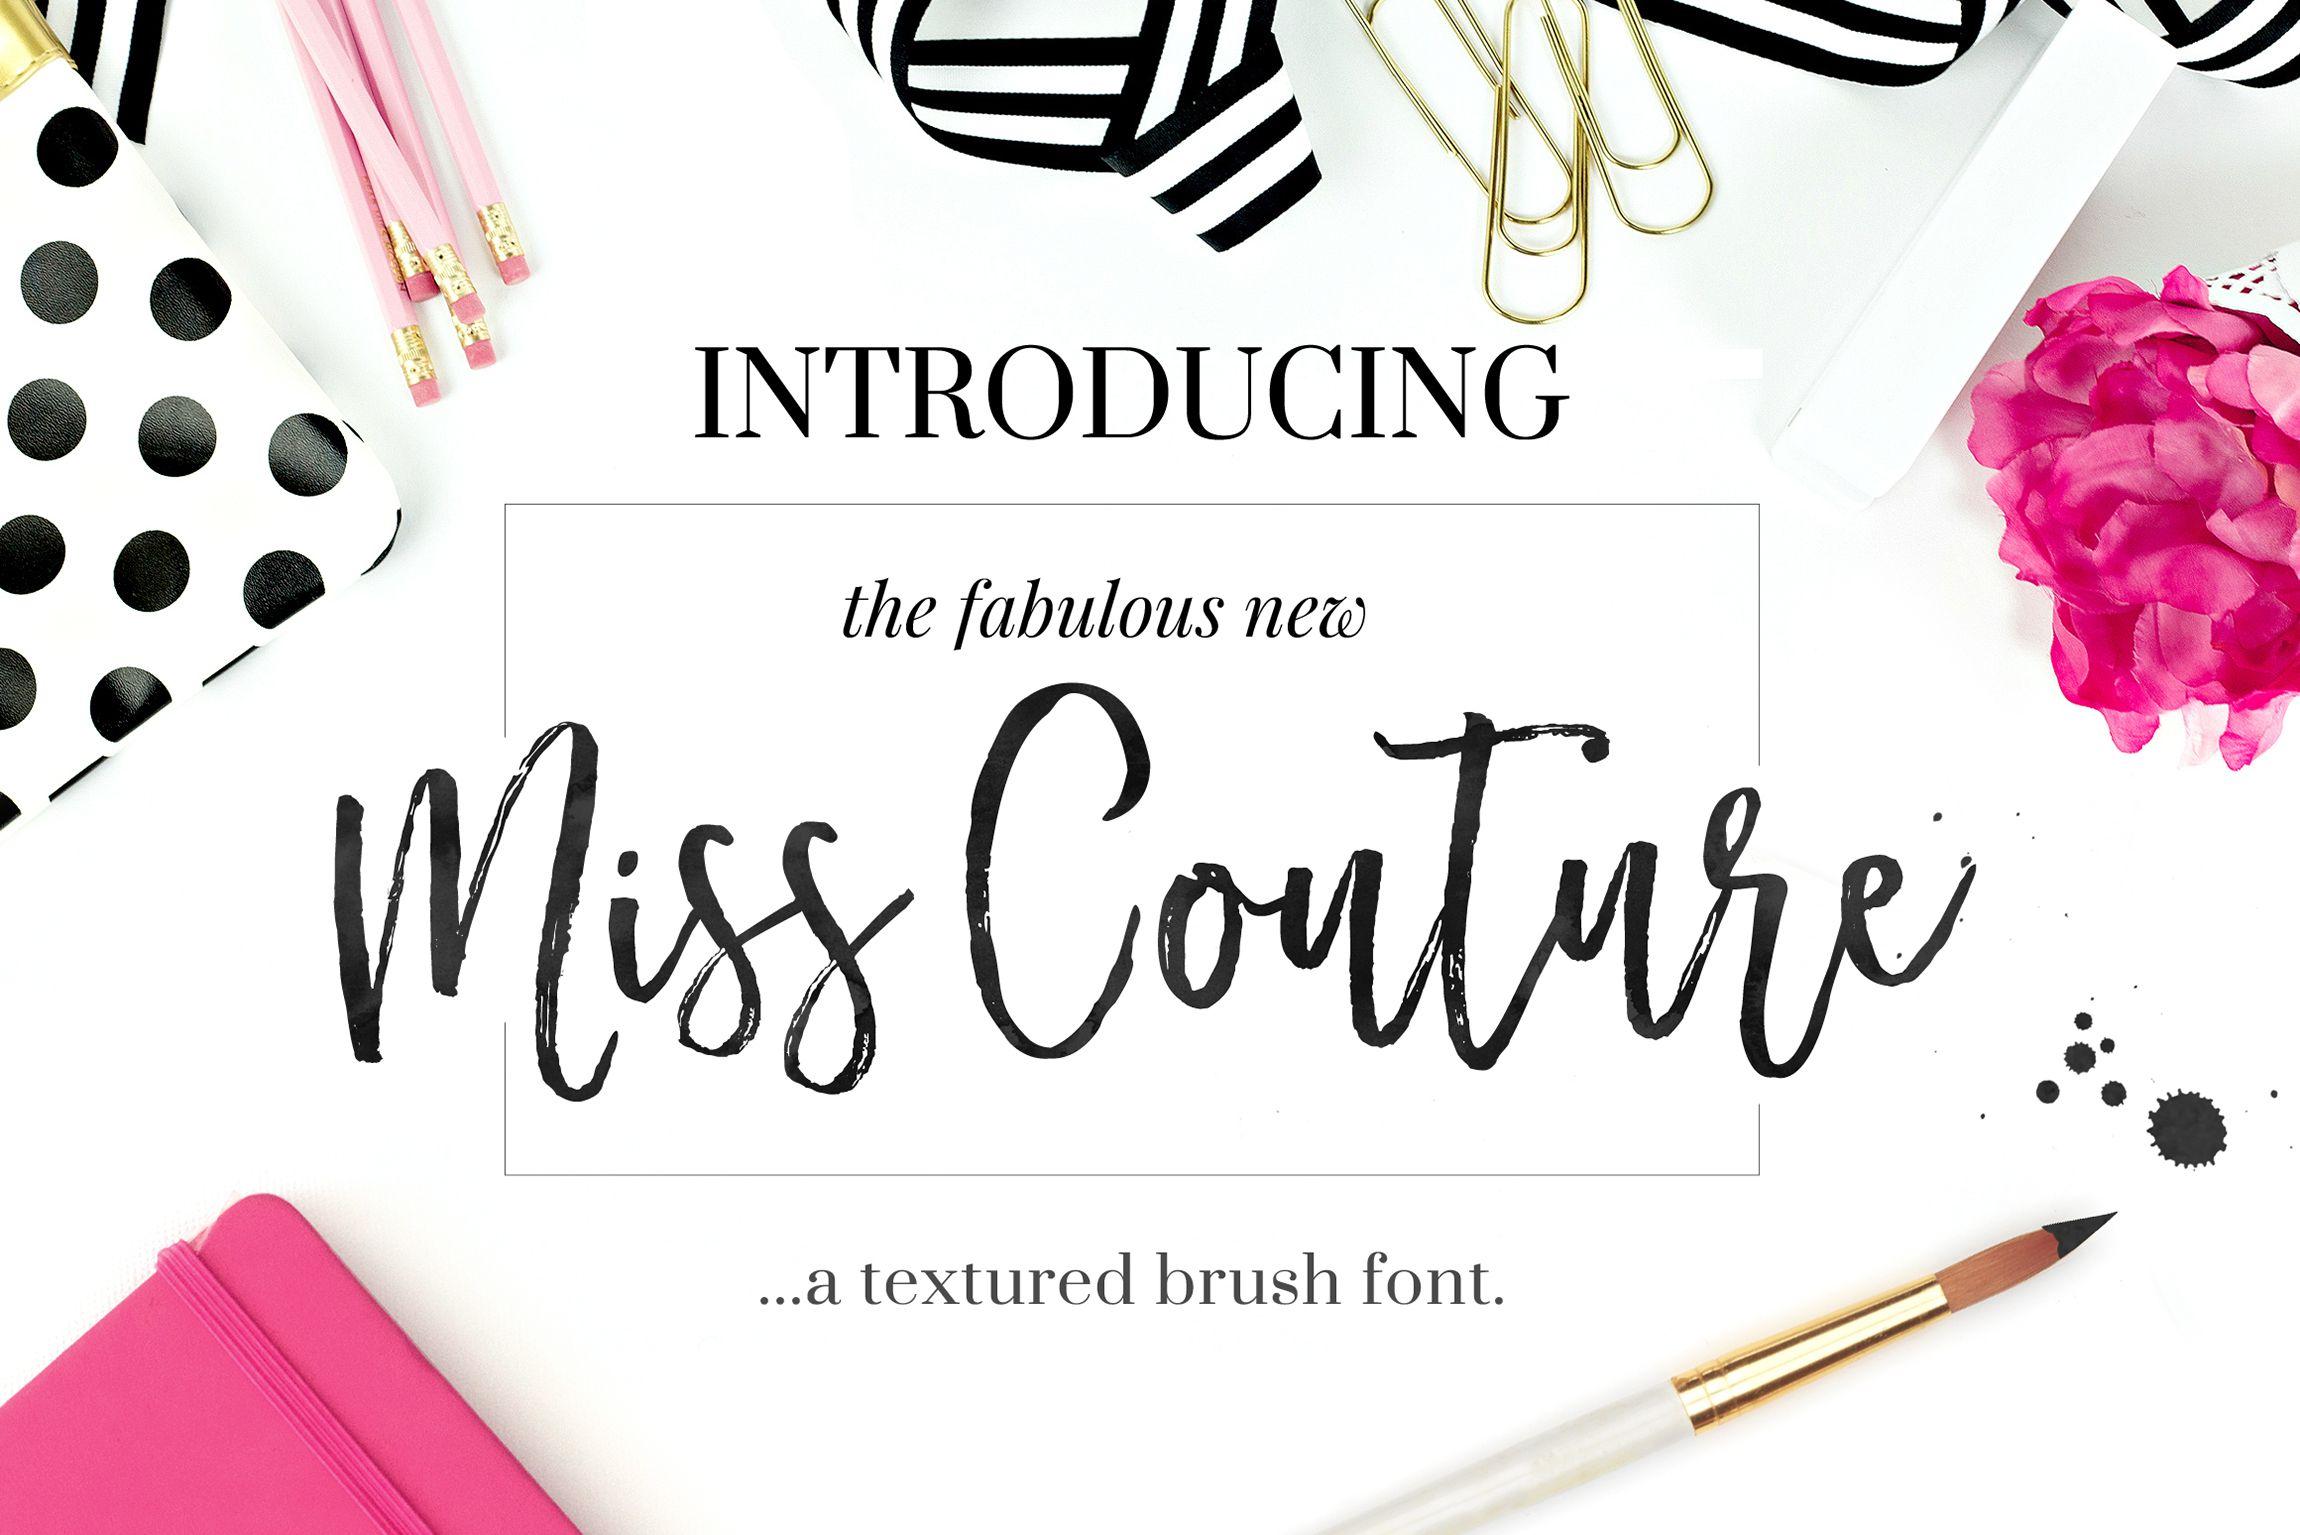 Miss couture brush script bonus by nicky laatz on @creativemarket